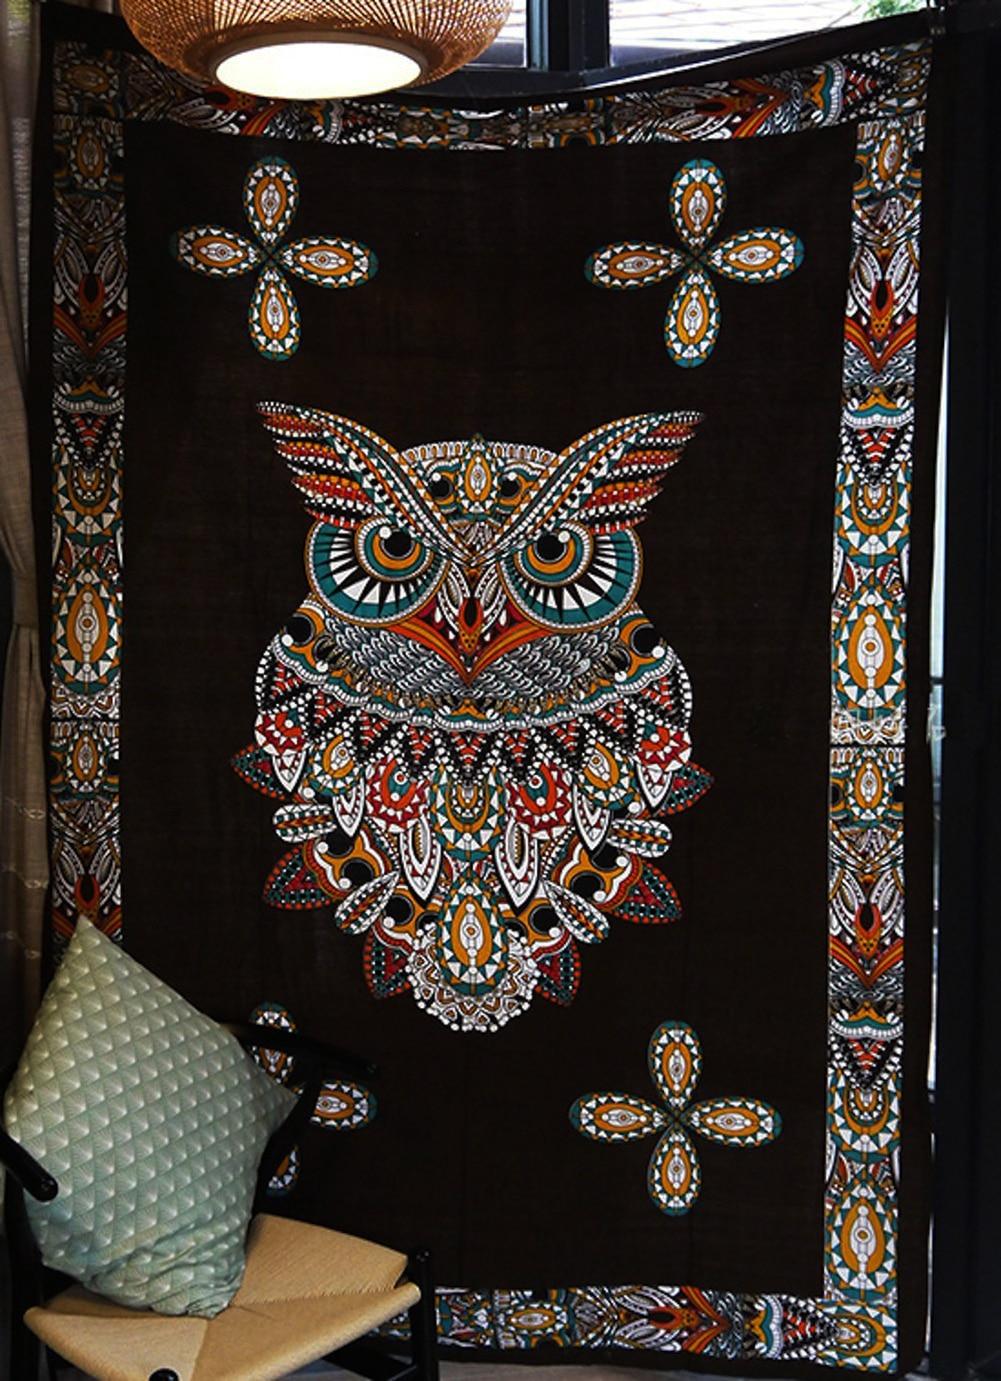 Enipate Indian Bohemia Mandala Tapestry Totem Owl Wall Tapestry Beach Towel Yoga Pad Blanket Camping Mattress Pad 200x150cm